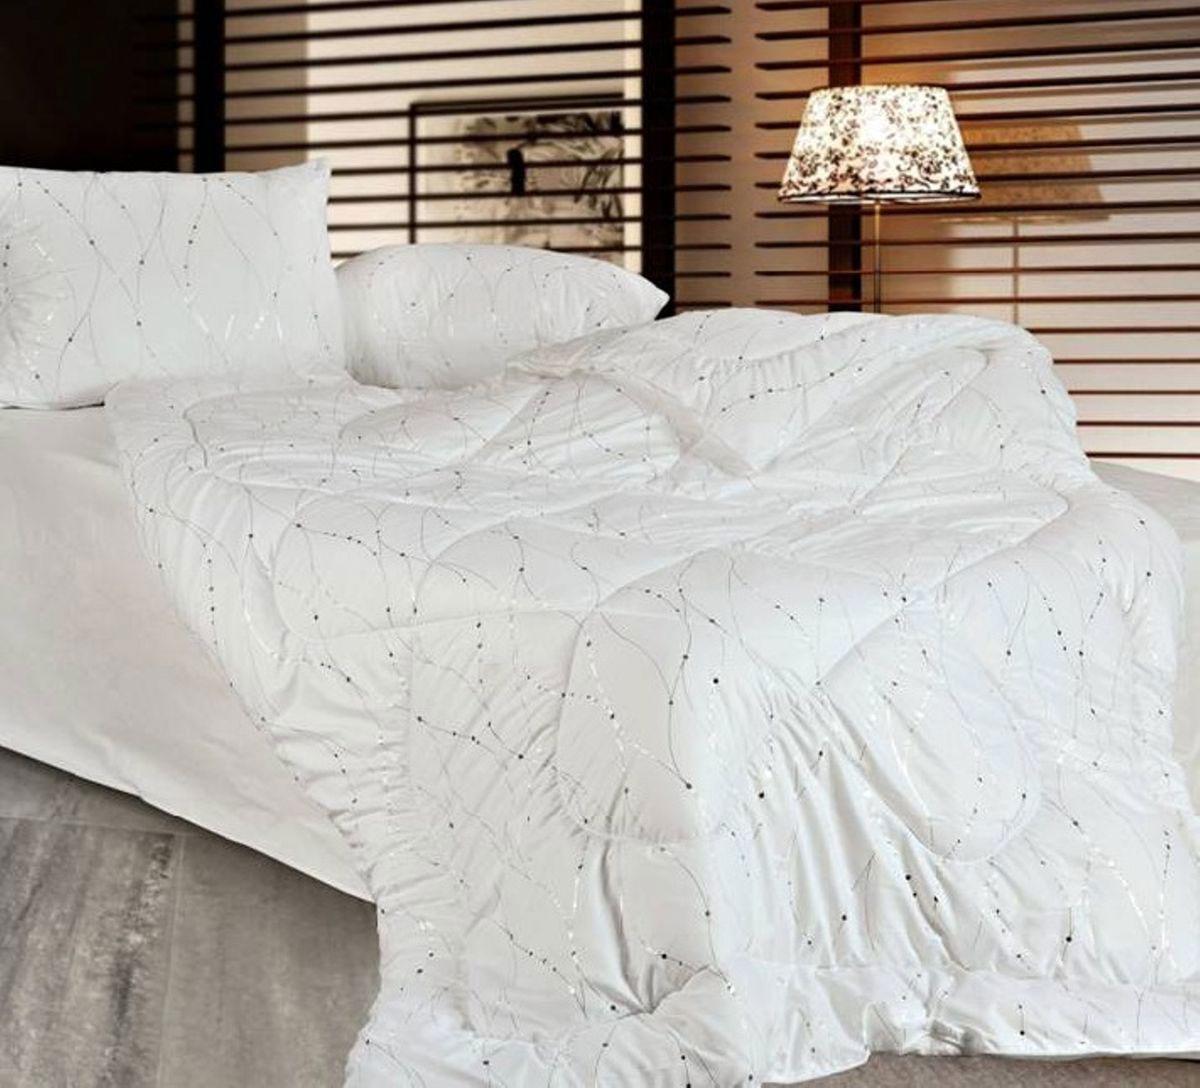 Одеяло Home & Style, наполнитель: соевое волокно, цвет: белый, 172 х 205 см одеяло dolly 172 см х 205 см